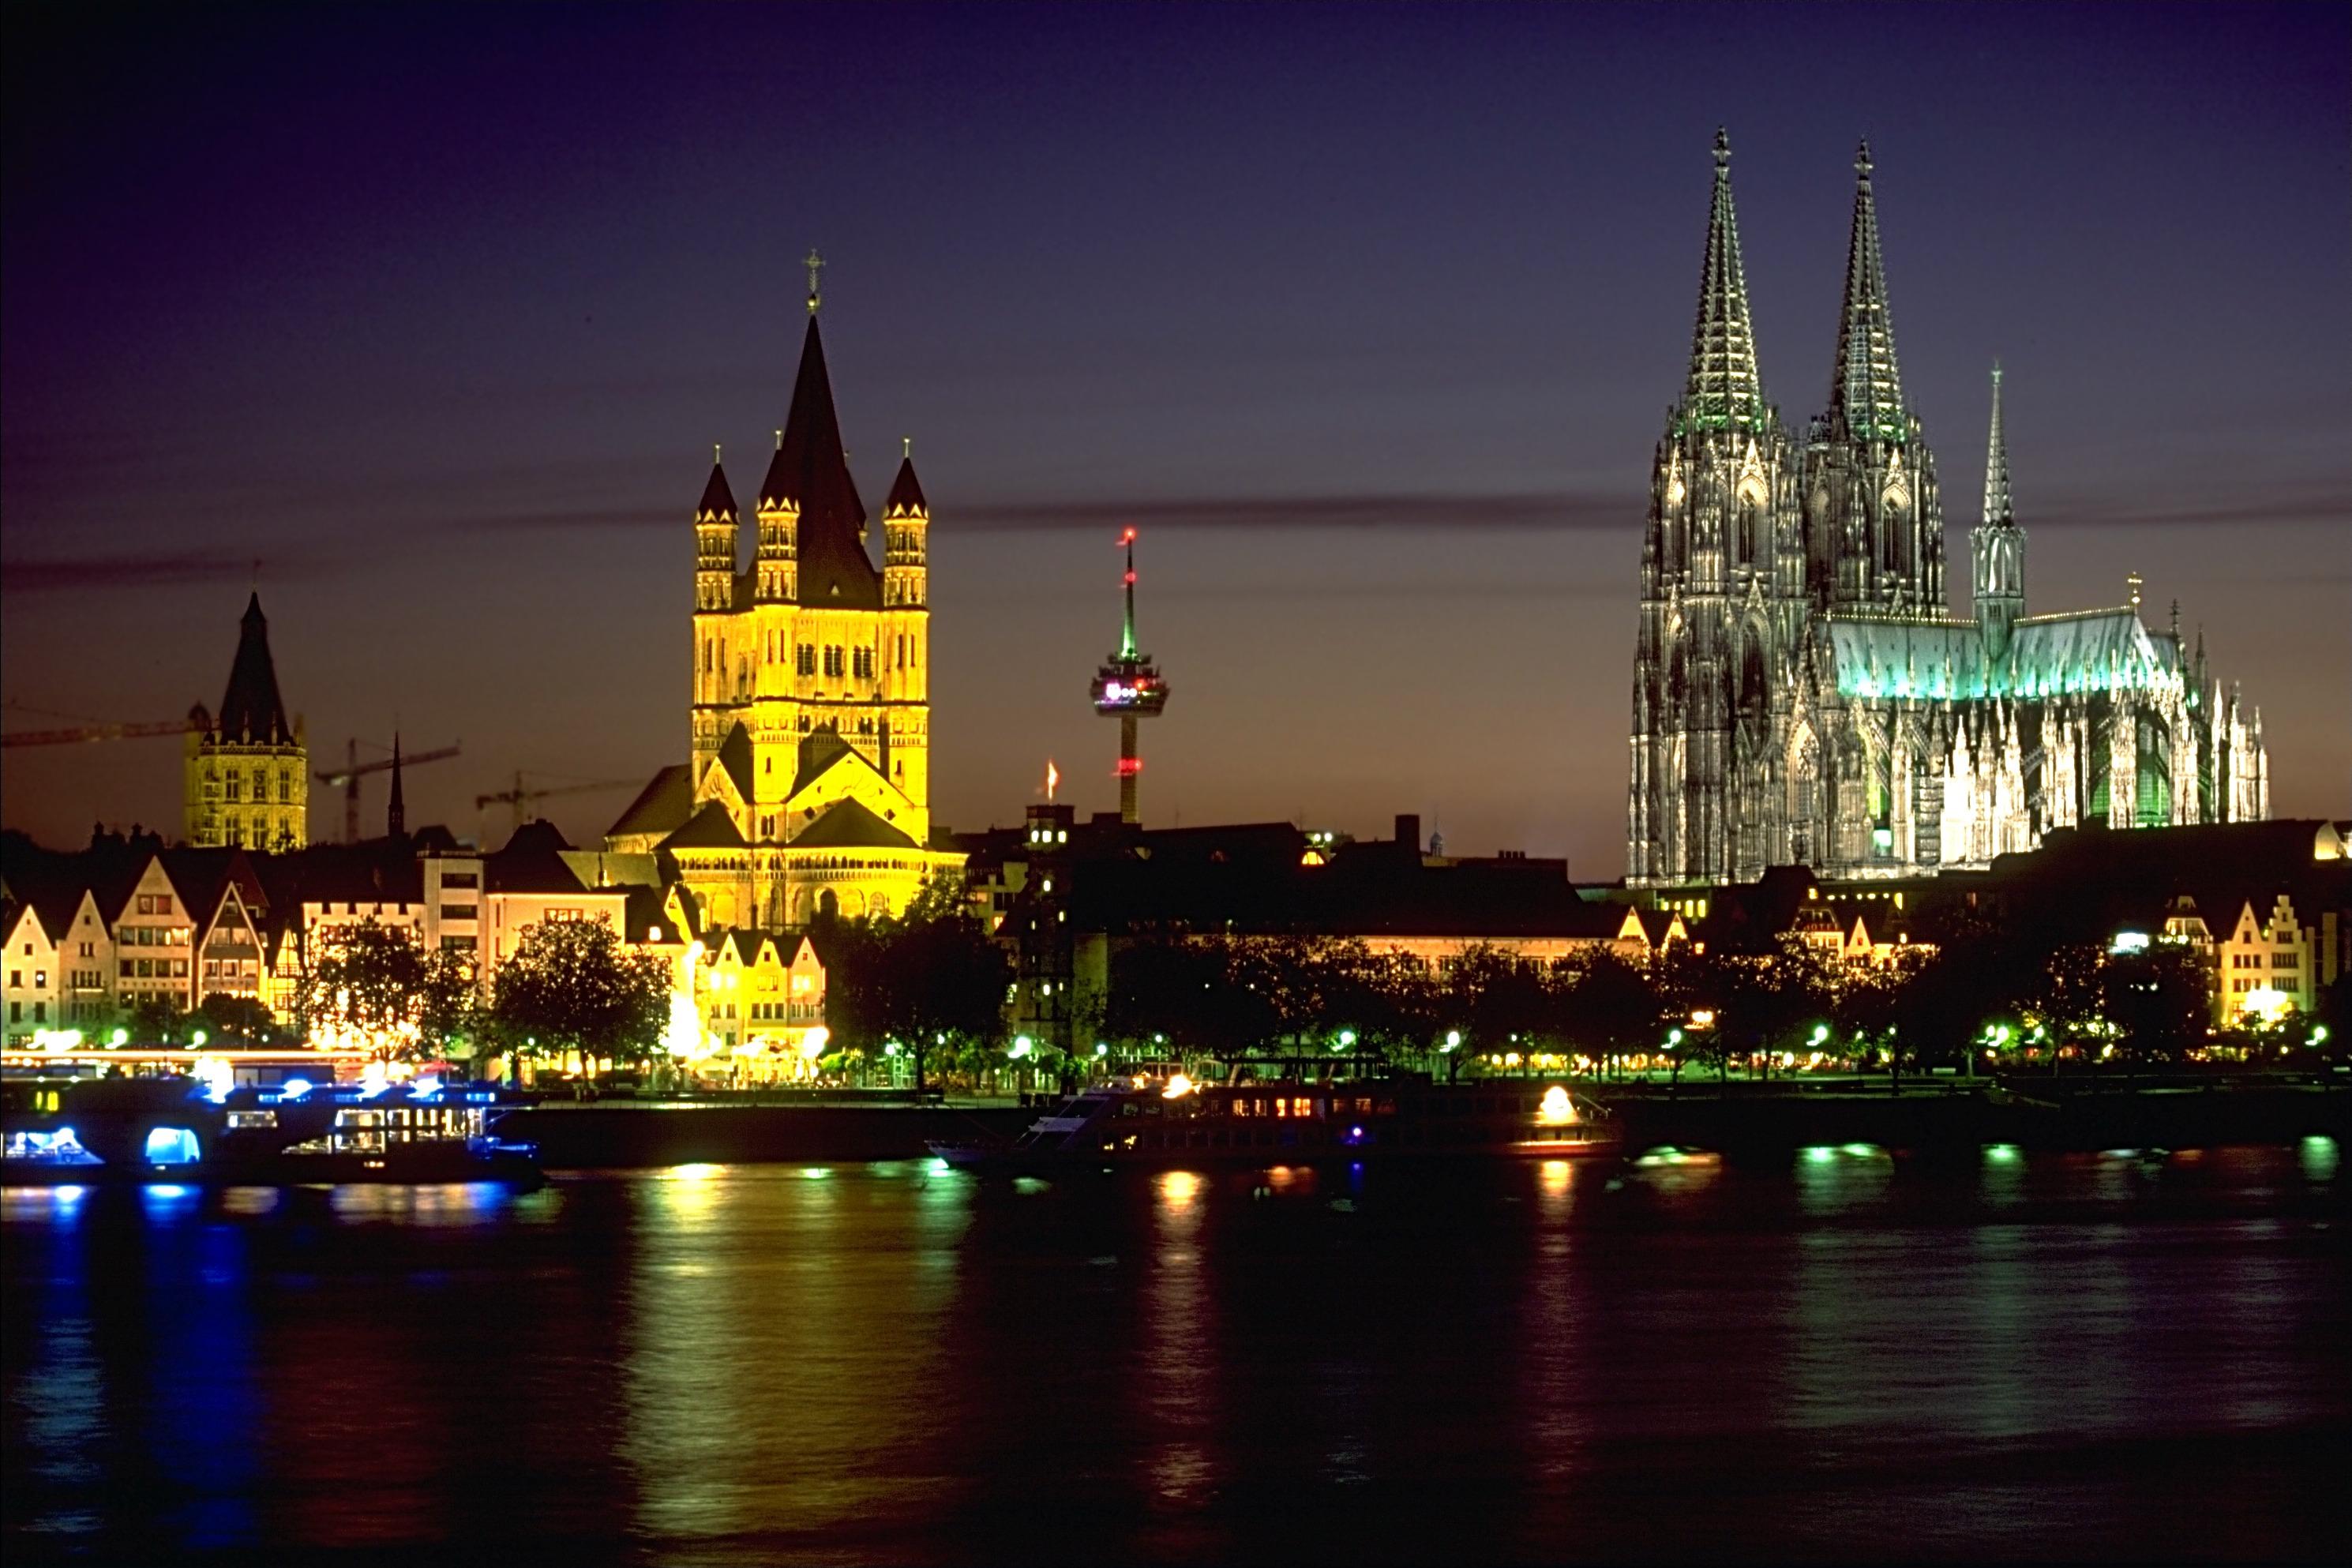 Cologne Germany  city photos gallery : Cologne, Germany SkyscraperCity